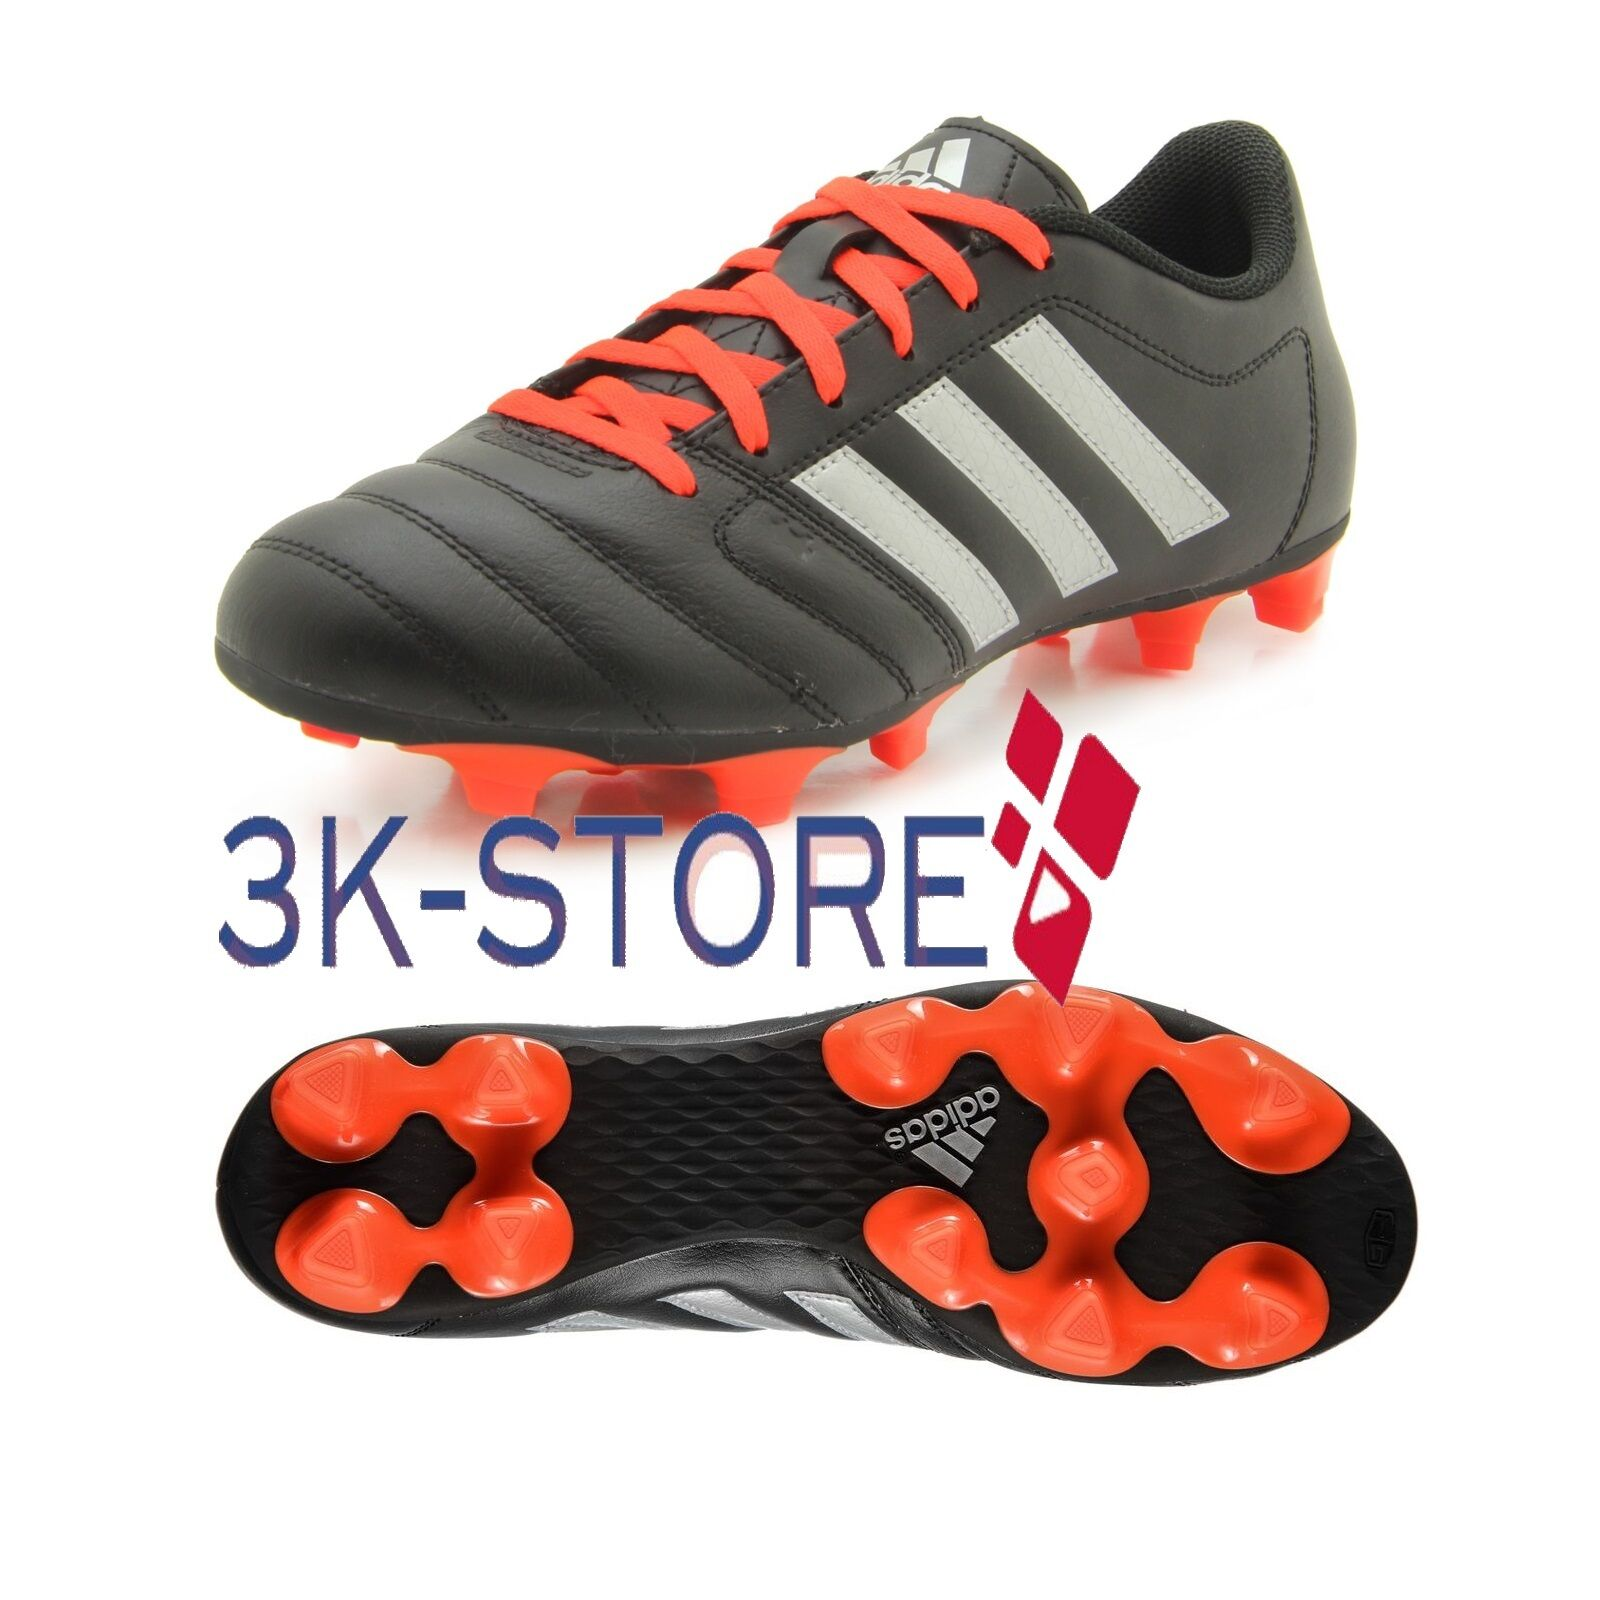 buy popular c7948 5bc3d ... top quality adidas x schuhe herren fußball soccer messi gloro x adidas  ace 852e6f ae685 cd6e7